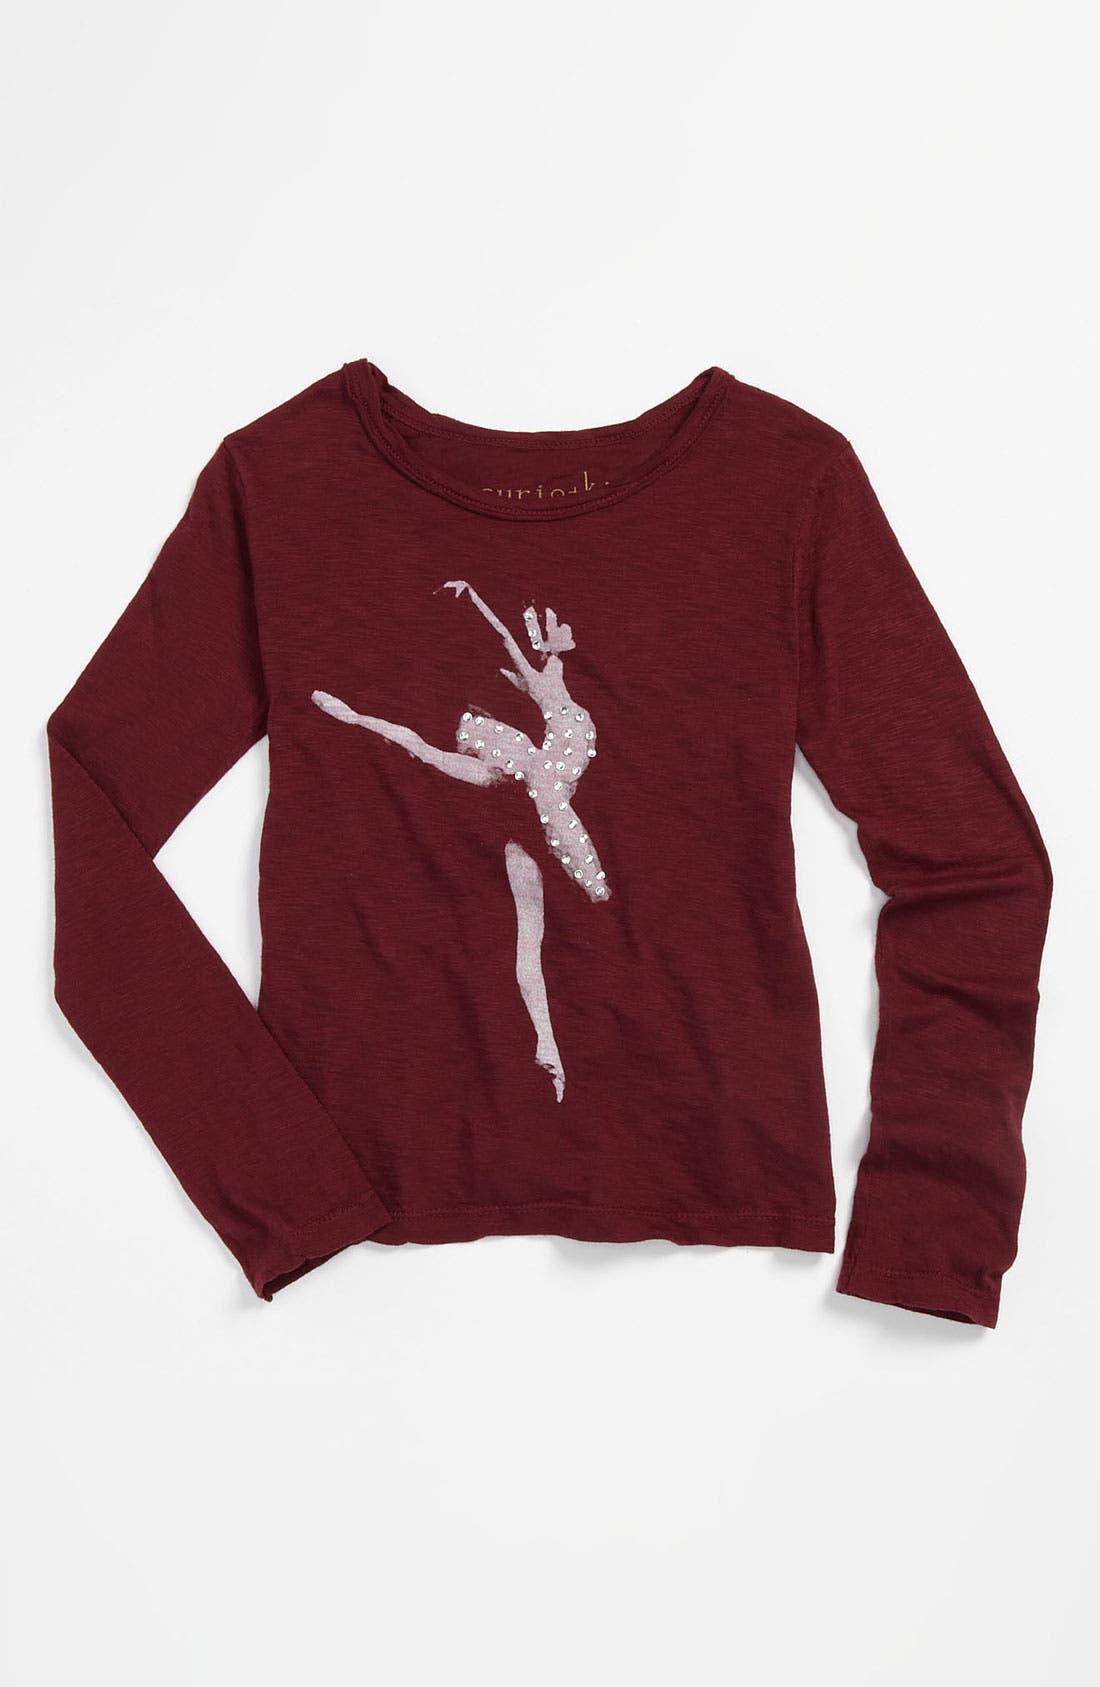 Alternate Image 1 Selected - Curio+Kind Ballerina Tee (Toddler)